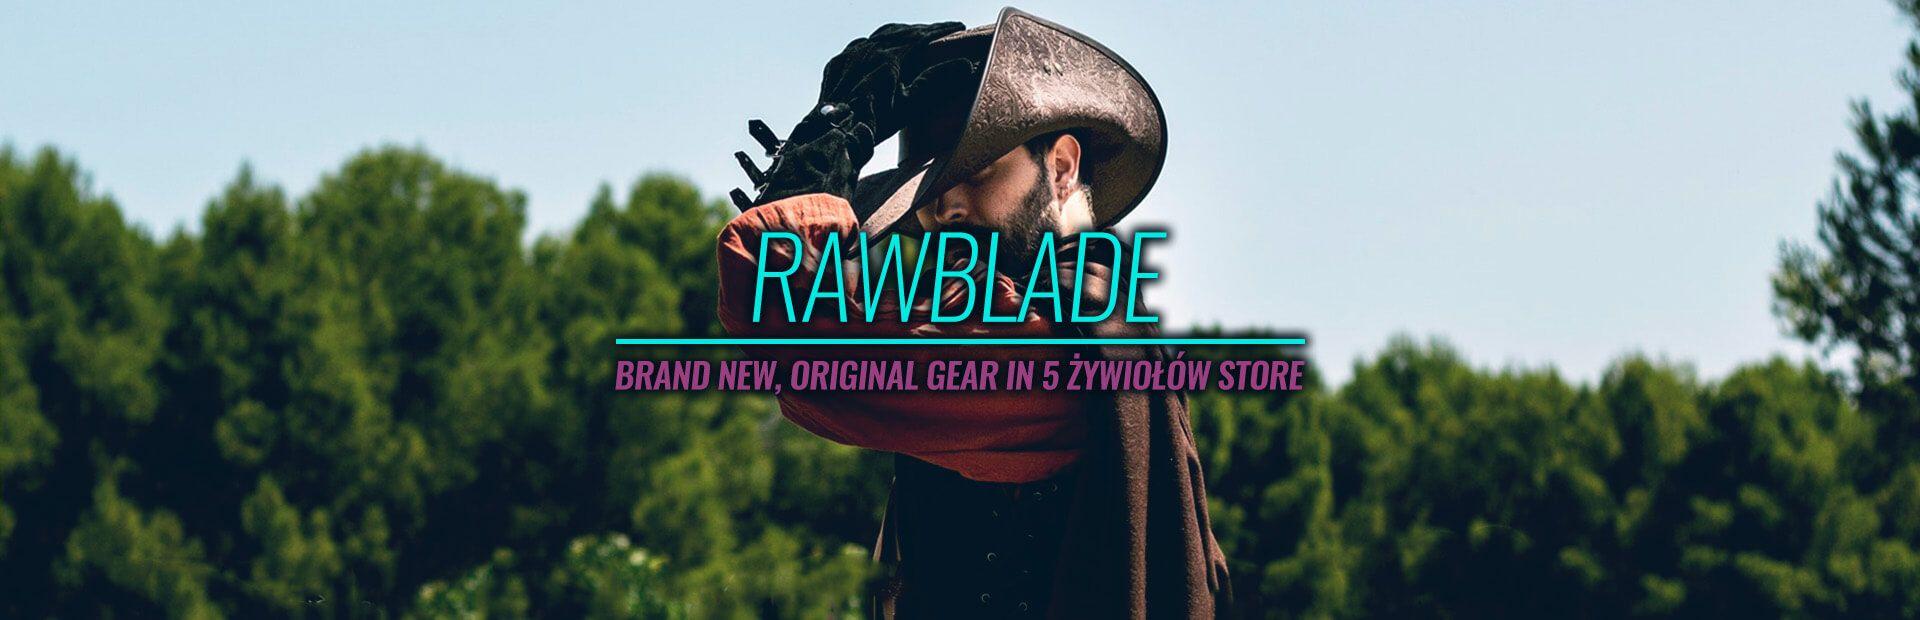 Raw Blade